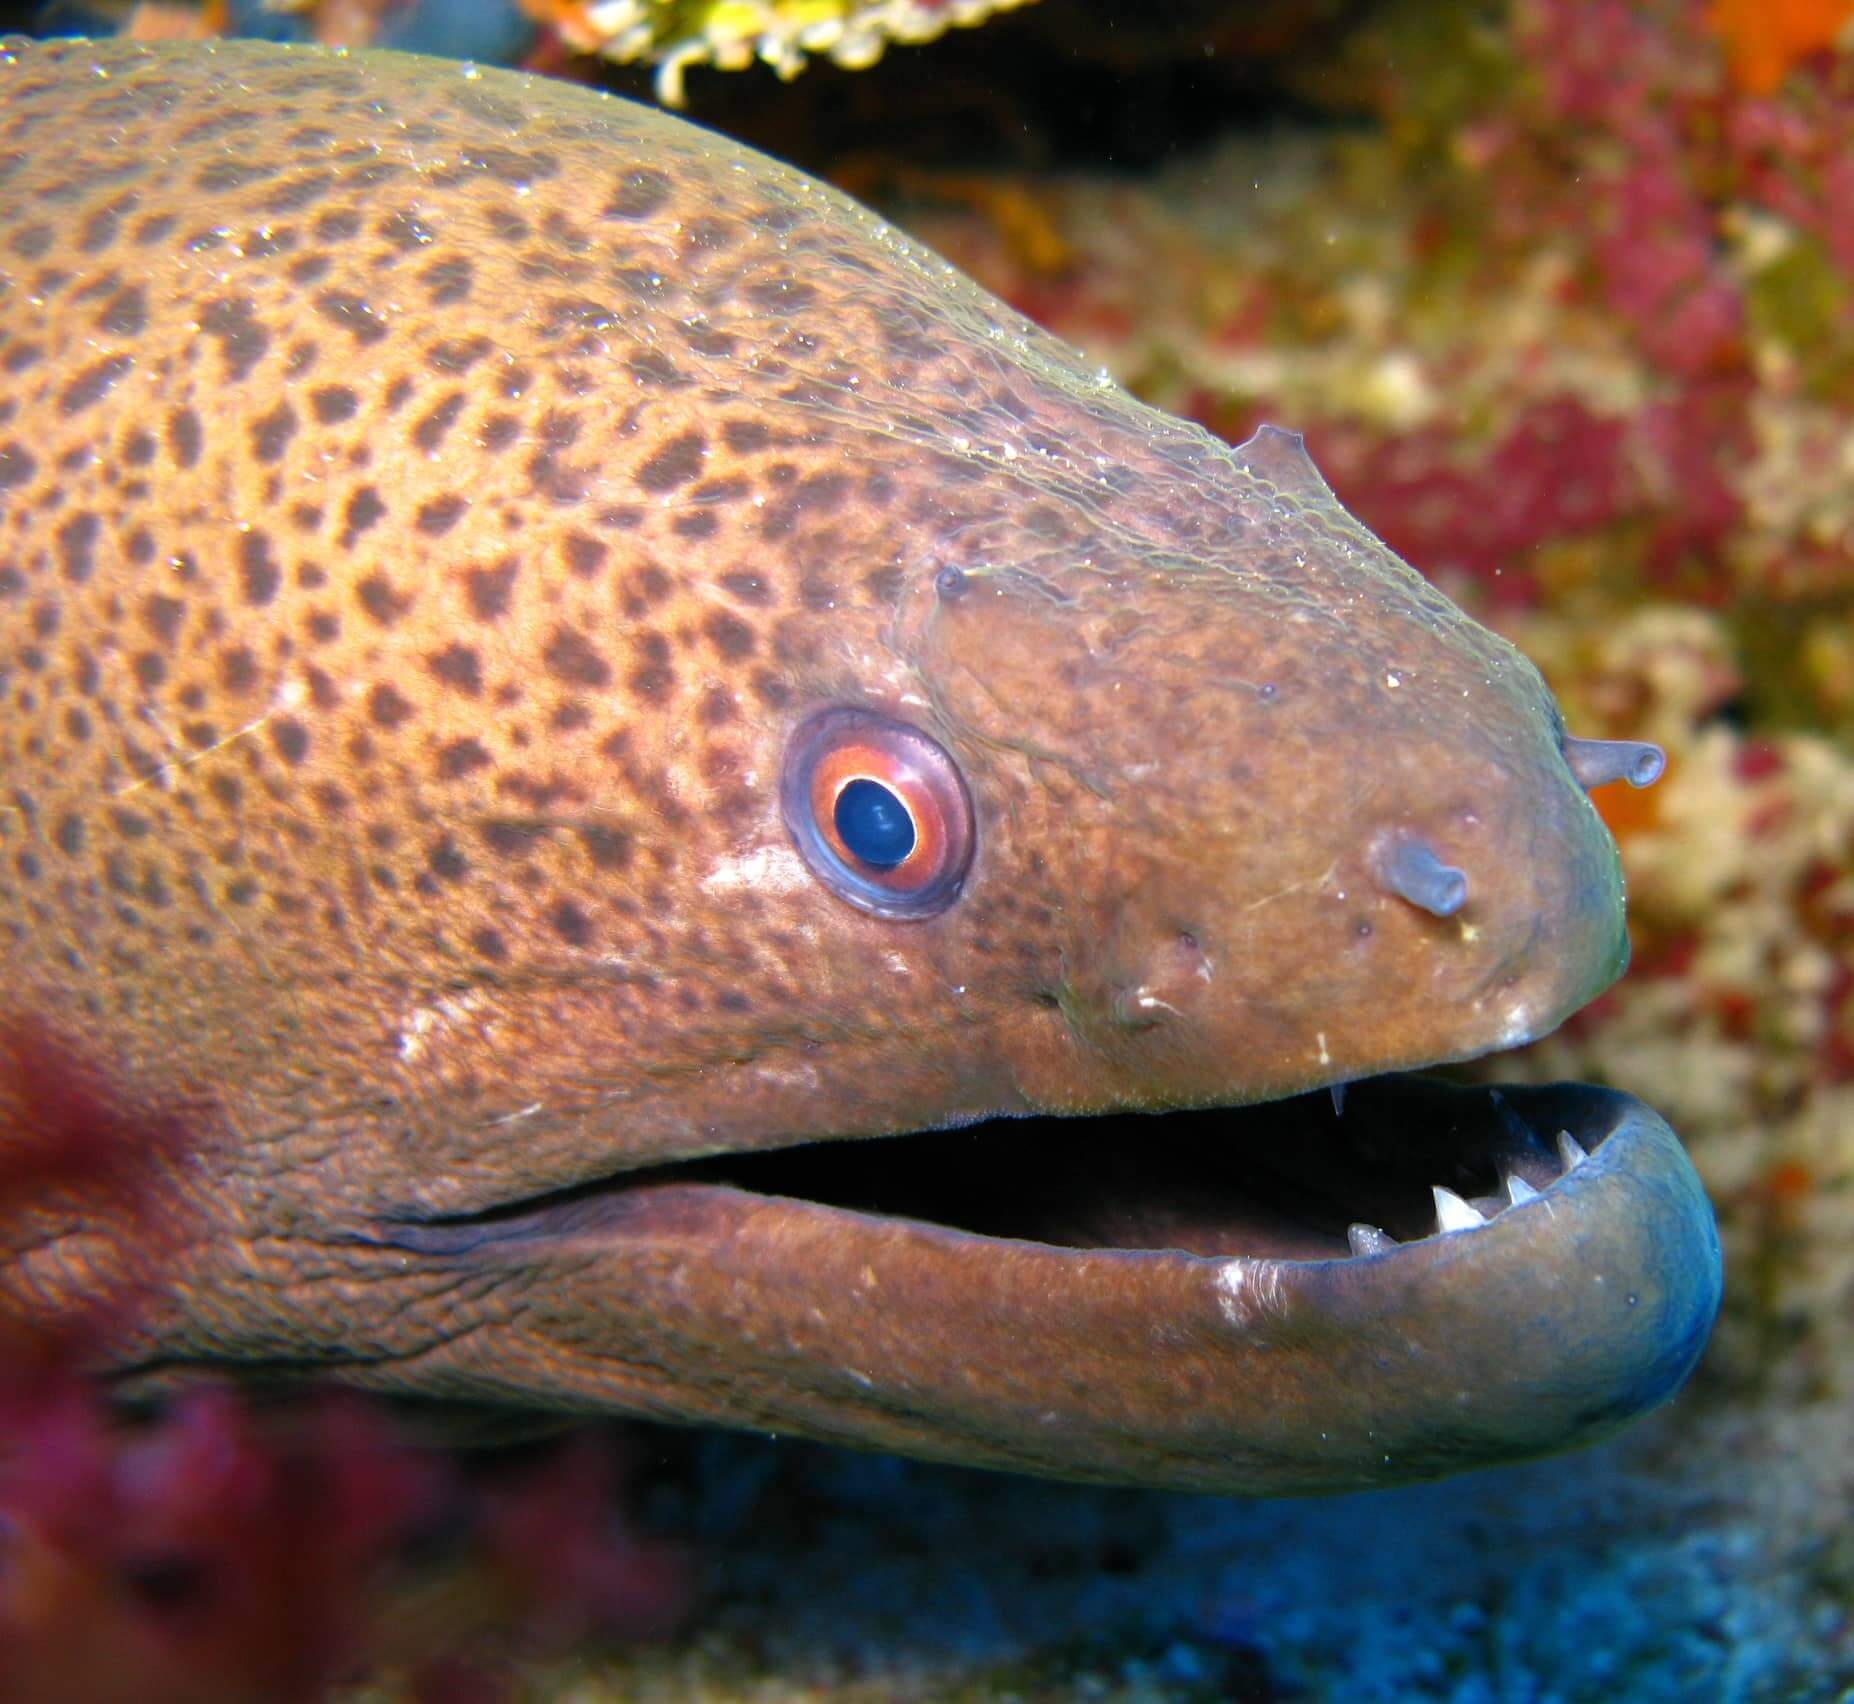 Egypt-REDSEA-Hurghada-Divepro-Academy-Diving-Center-Moray-Eel